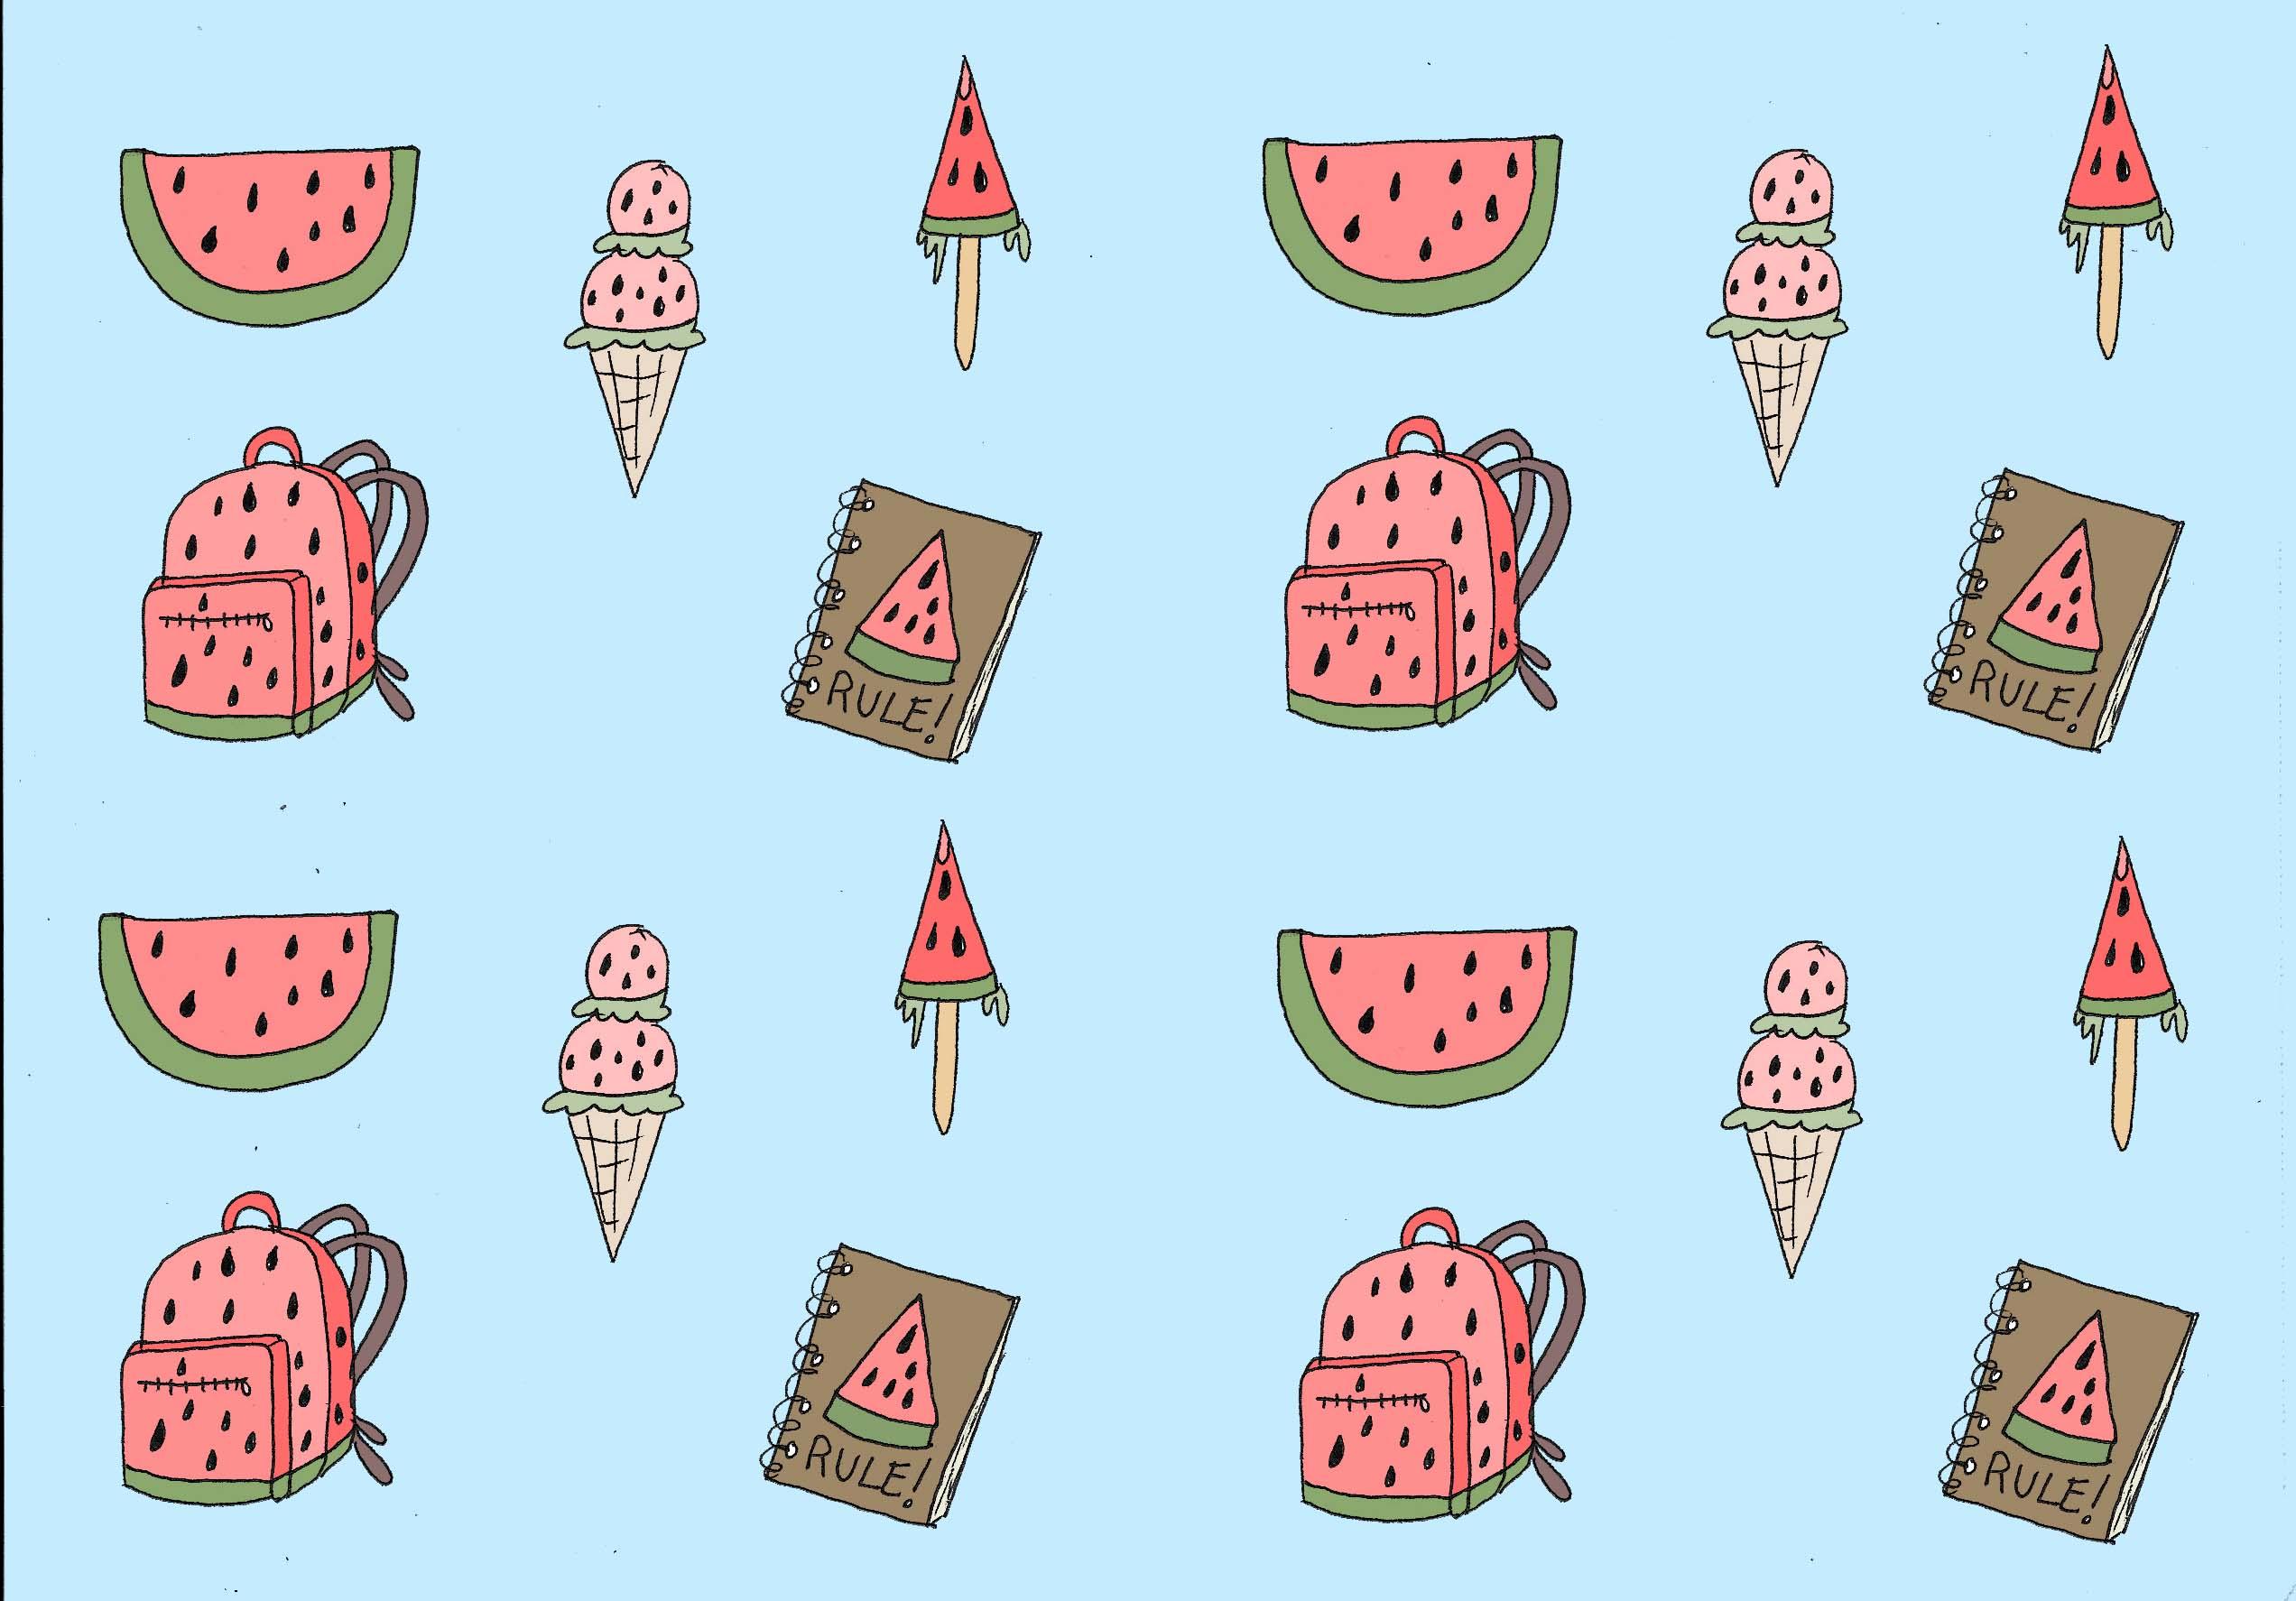 Watermelon girl's favorite things